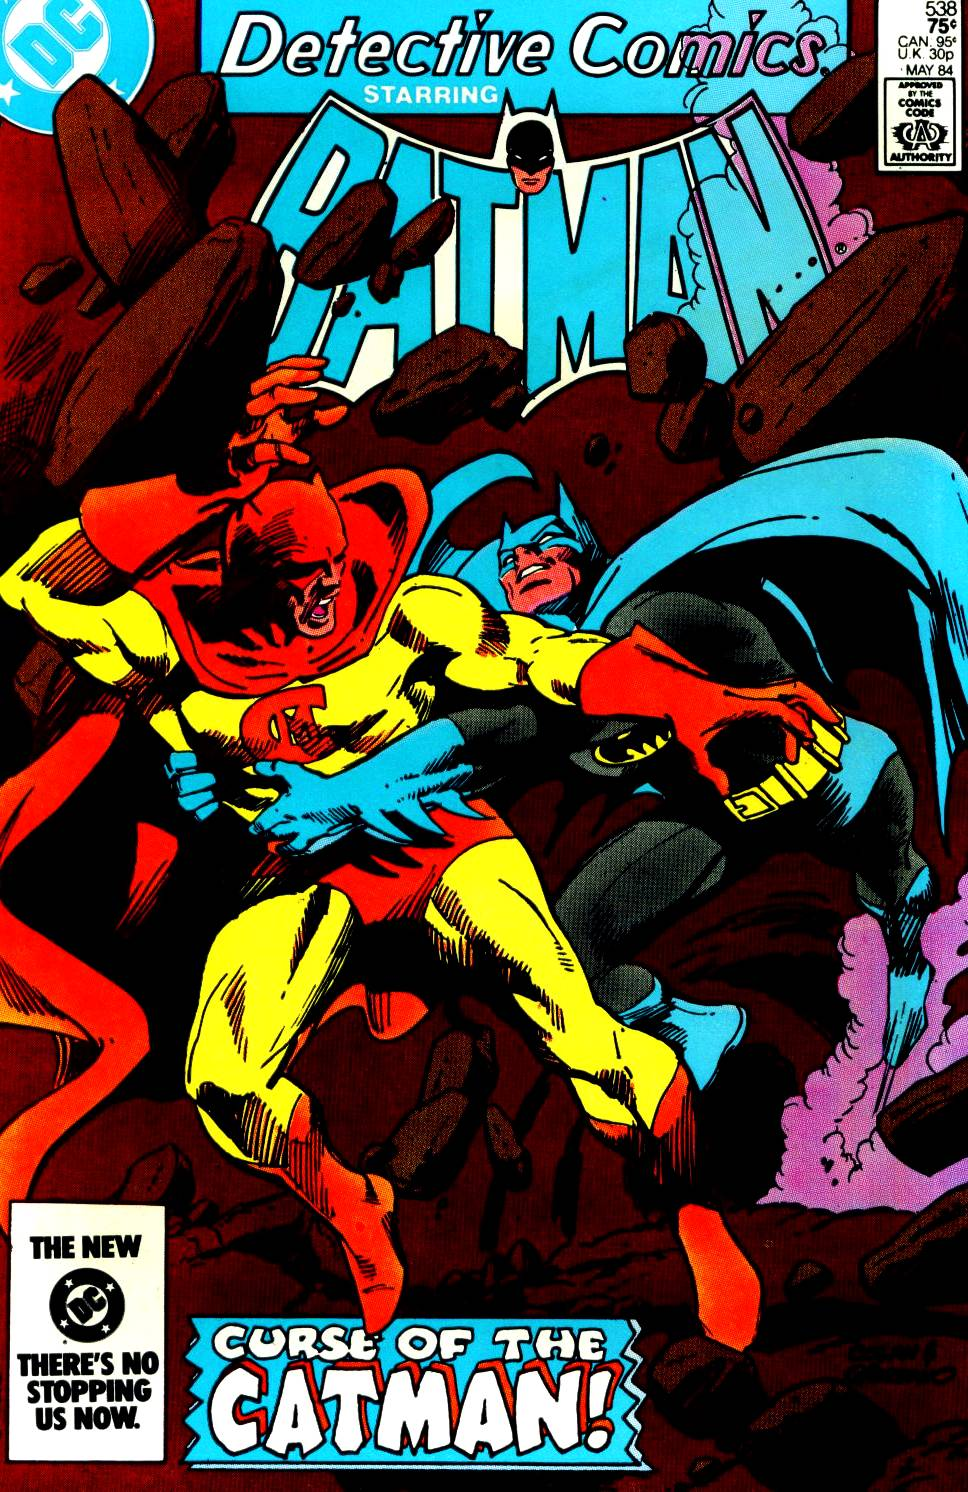 Detective Comics (1937) 538 Page 1